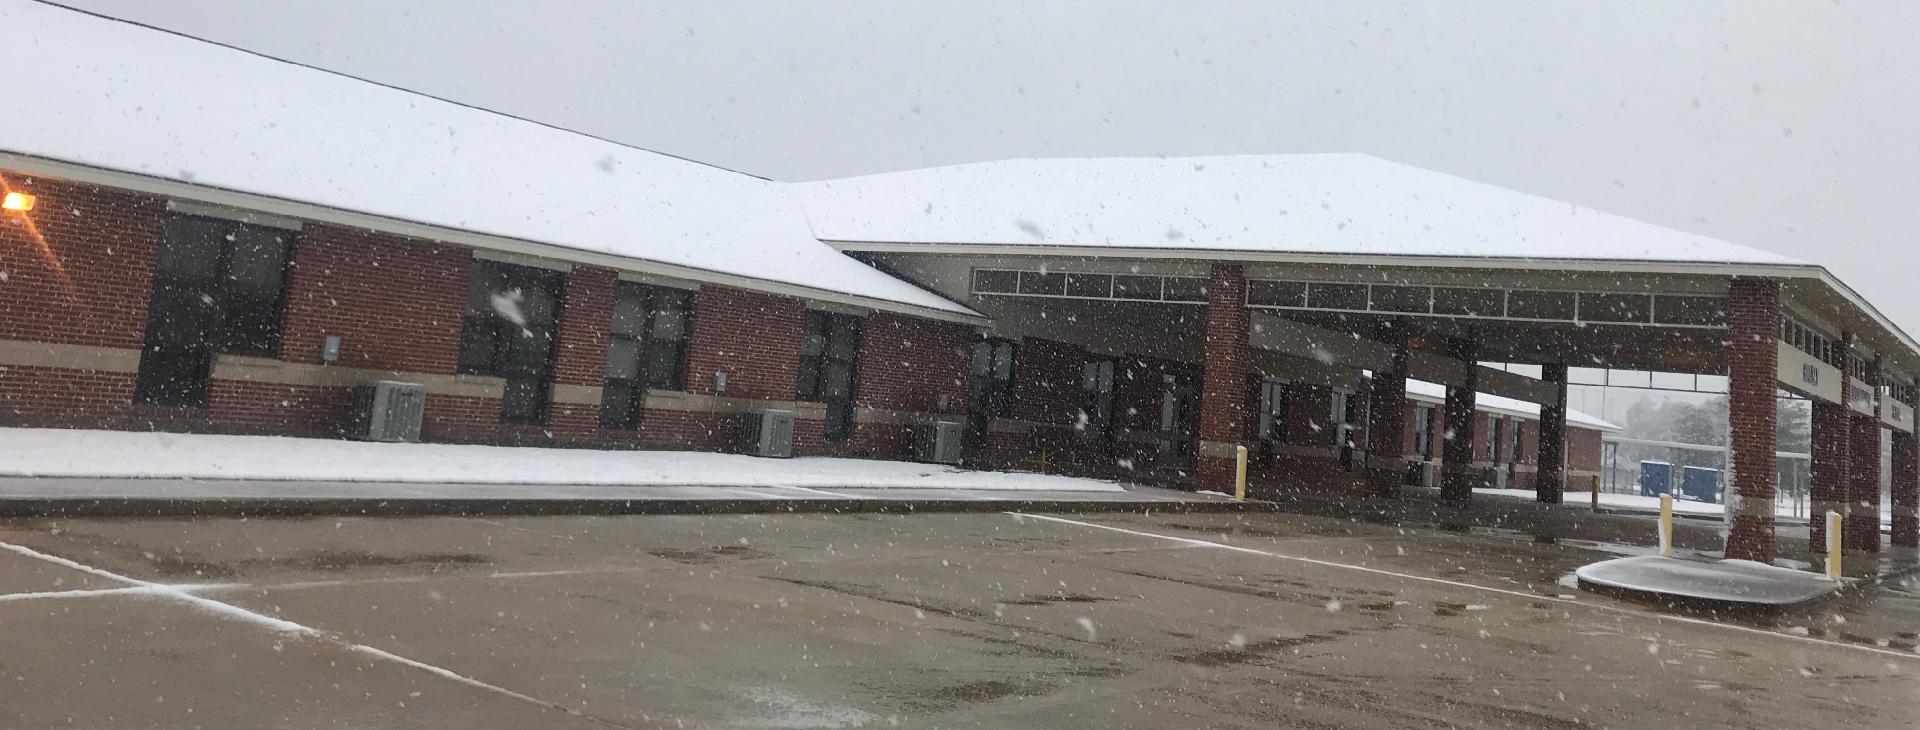 Brusly Elementary School PTO